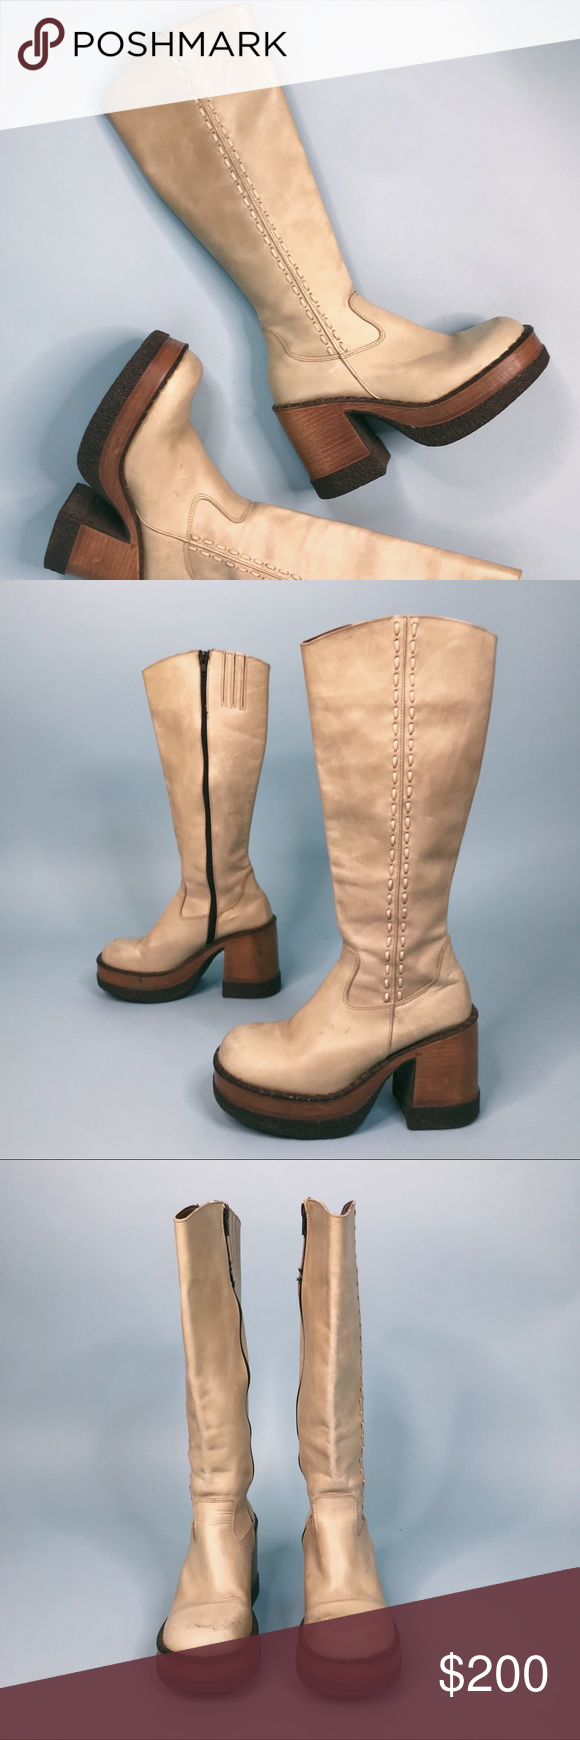 709ae83b565 VTG RARE 90s London Underground Platform Boots Genuine leather 90s does 70s platform  boots. Pale